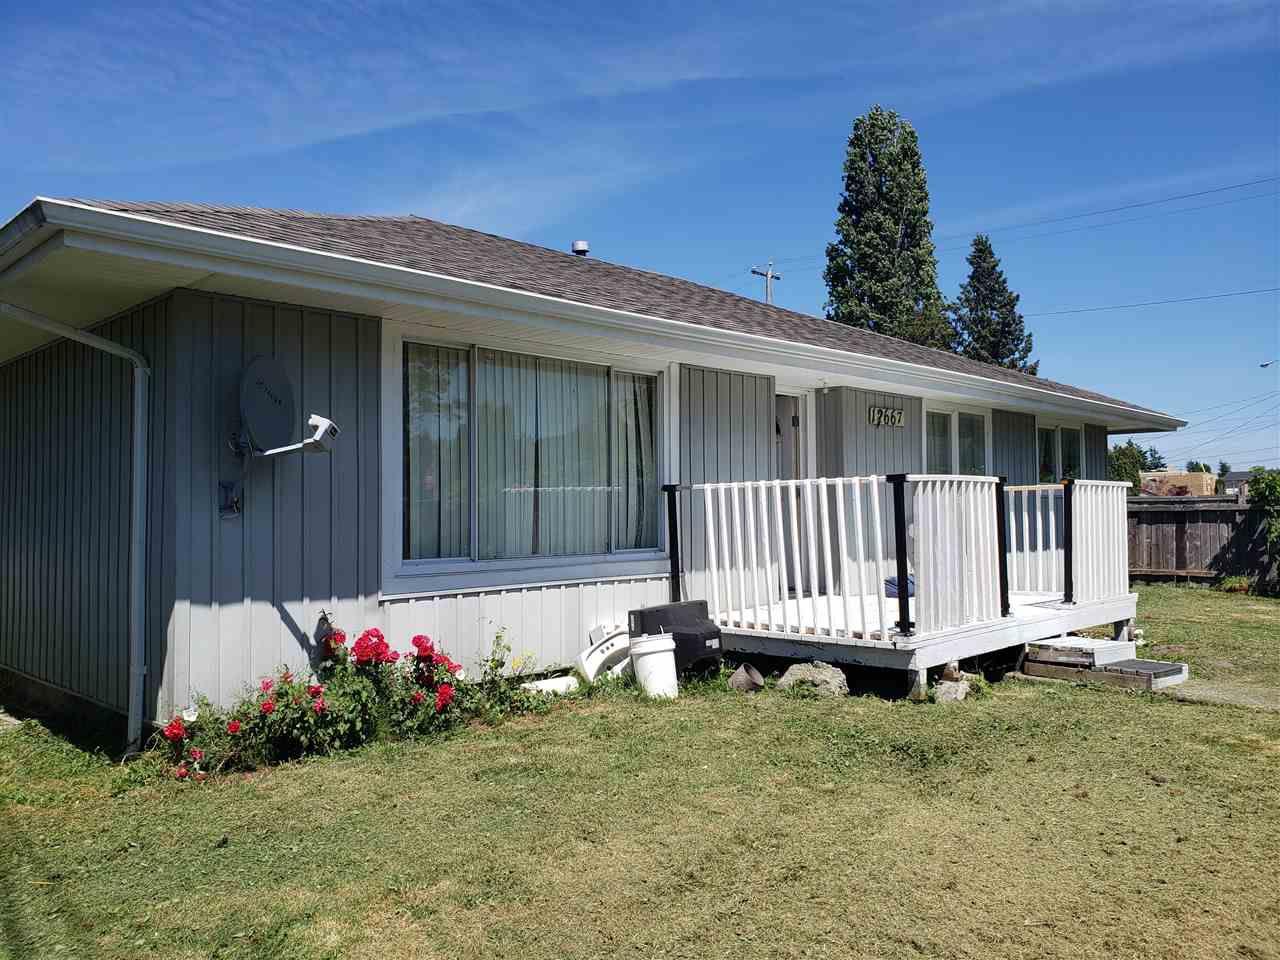 Main Photo: 12667 115 Avenue in Surrey: Bridgeview House for sale (North Surrey)  : MLS®# R2379882